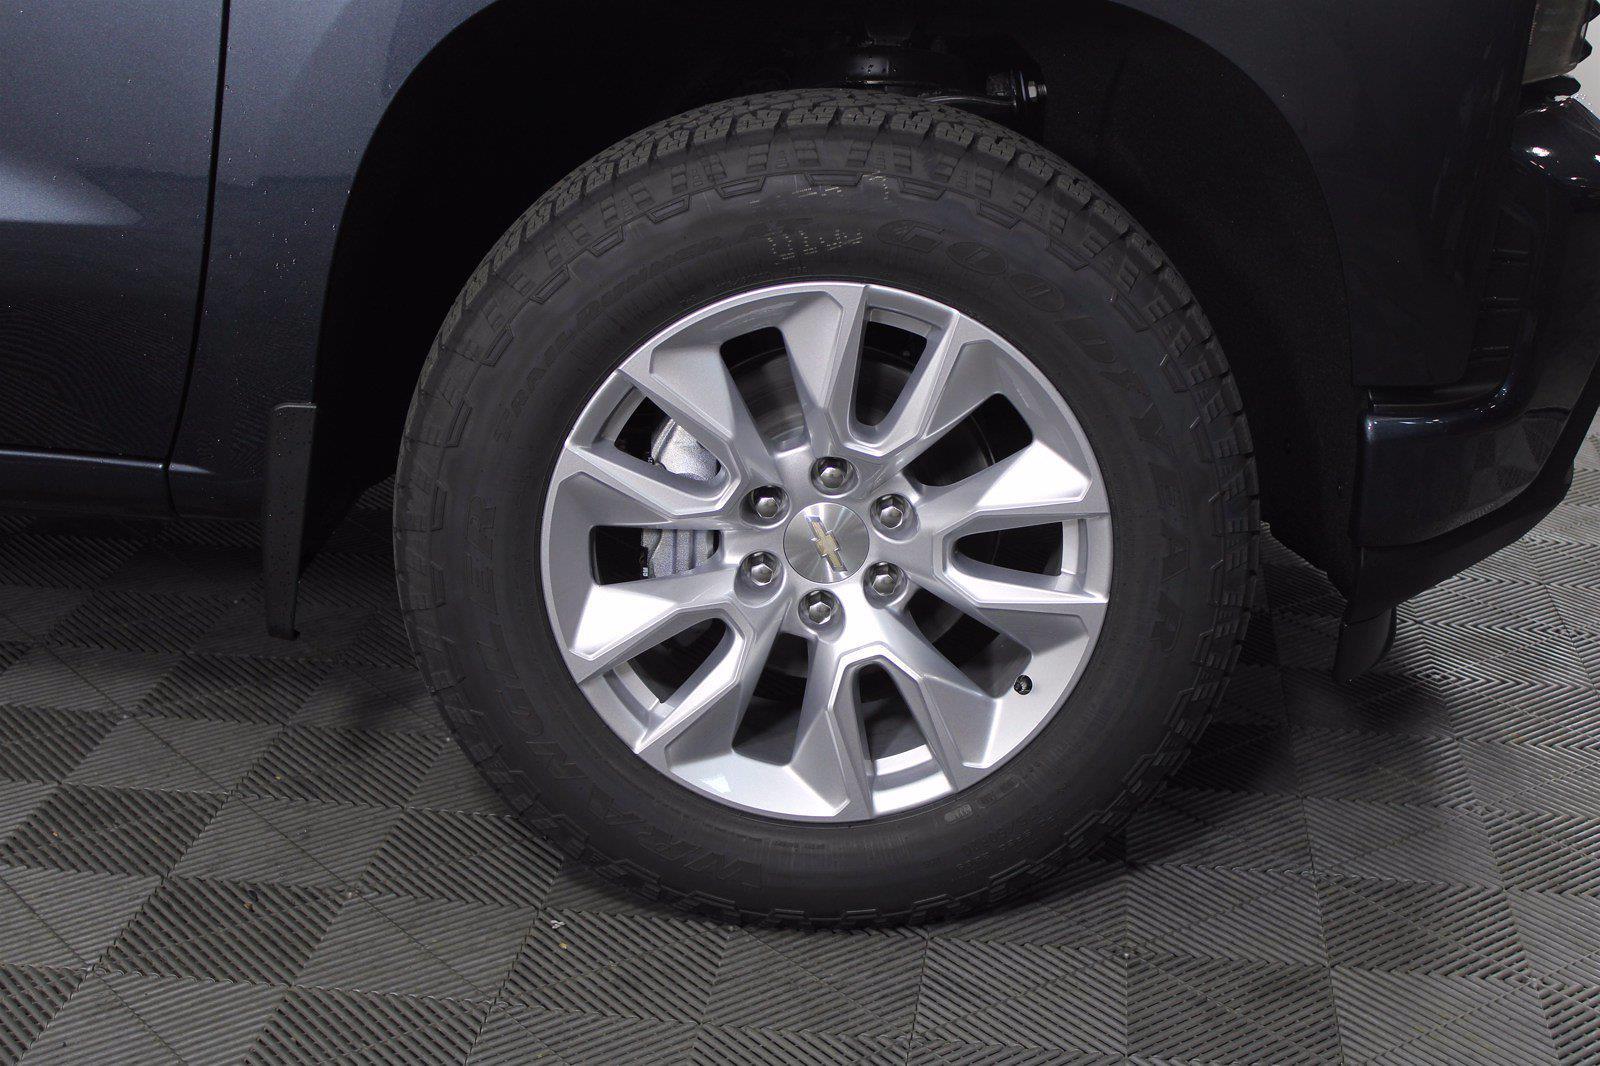 2021 Chevrolet Silverado 1500 Double Cab 4x4, Pickup #D111013 - photo 6